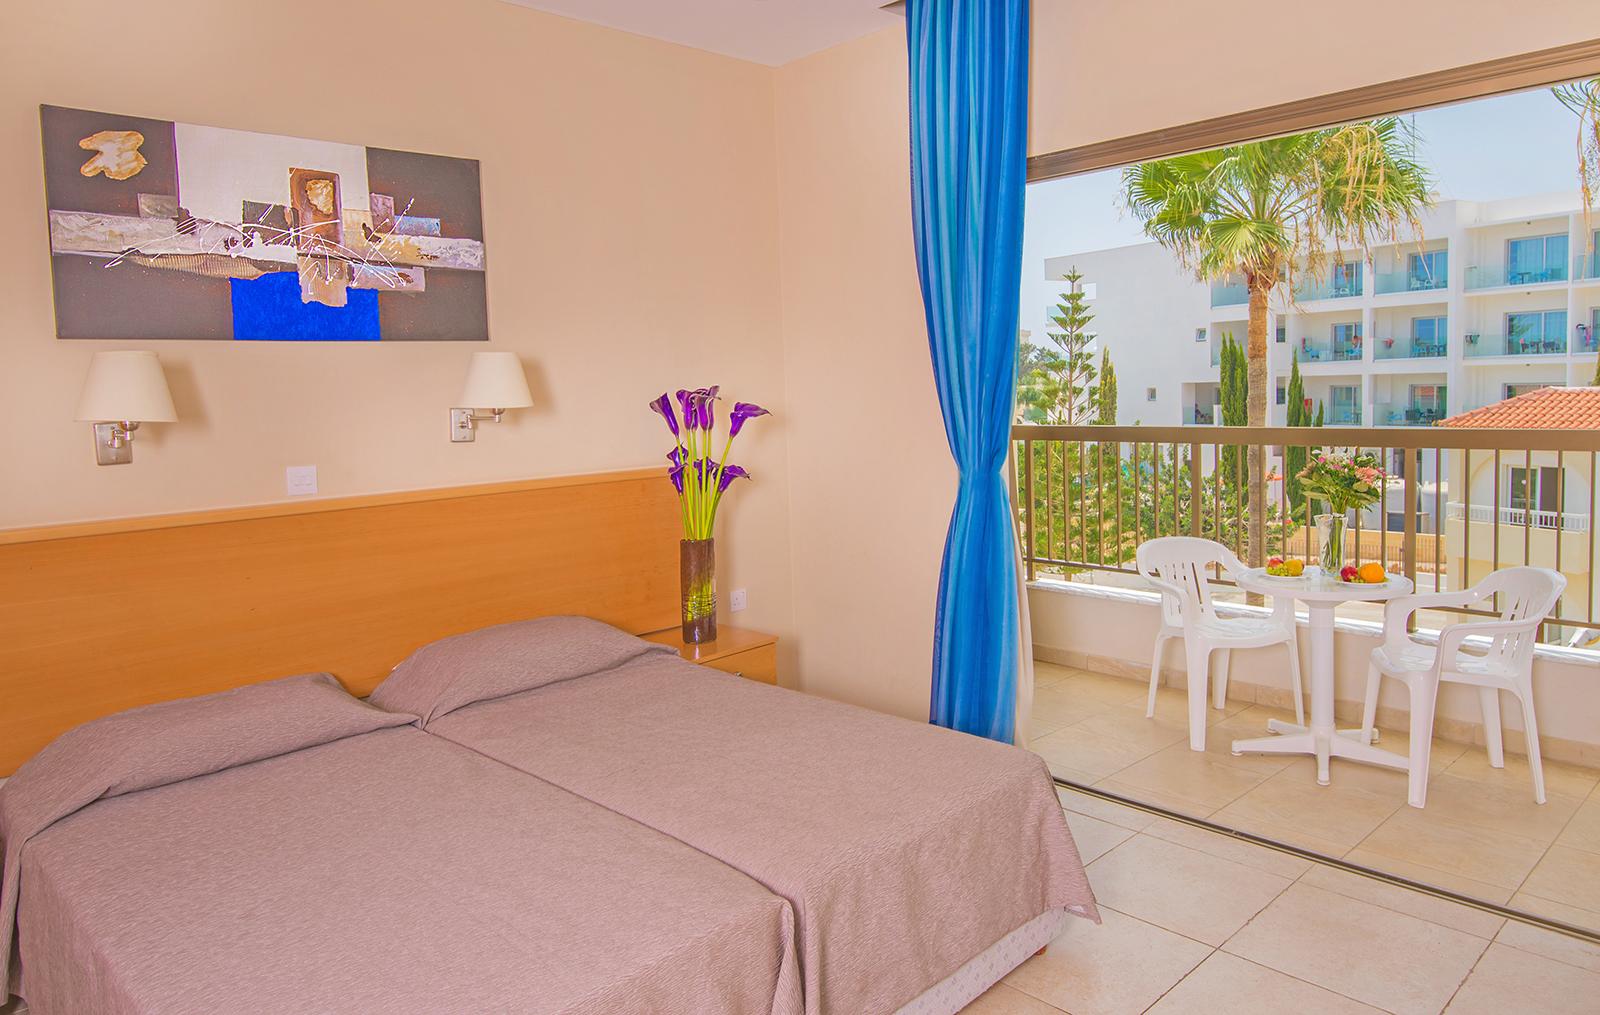 Hotel rooms in Ayia Napa, Cyprus